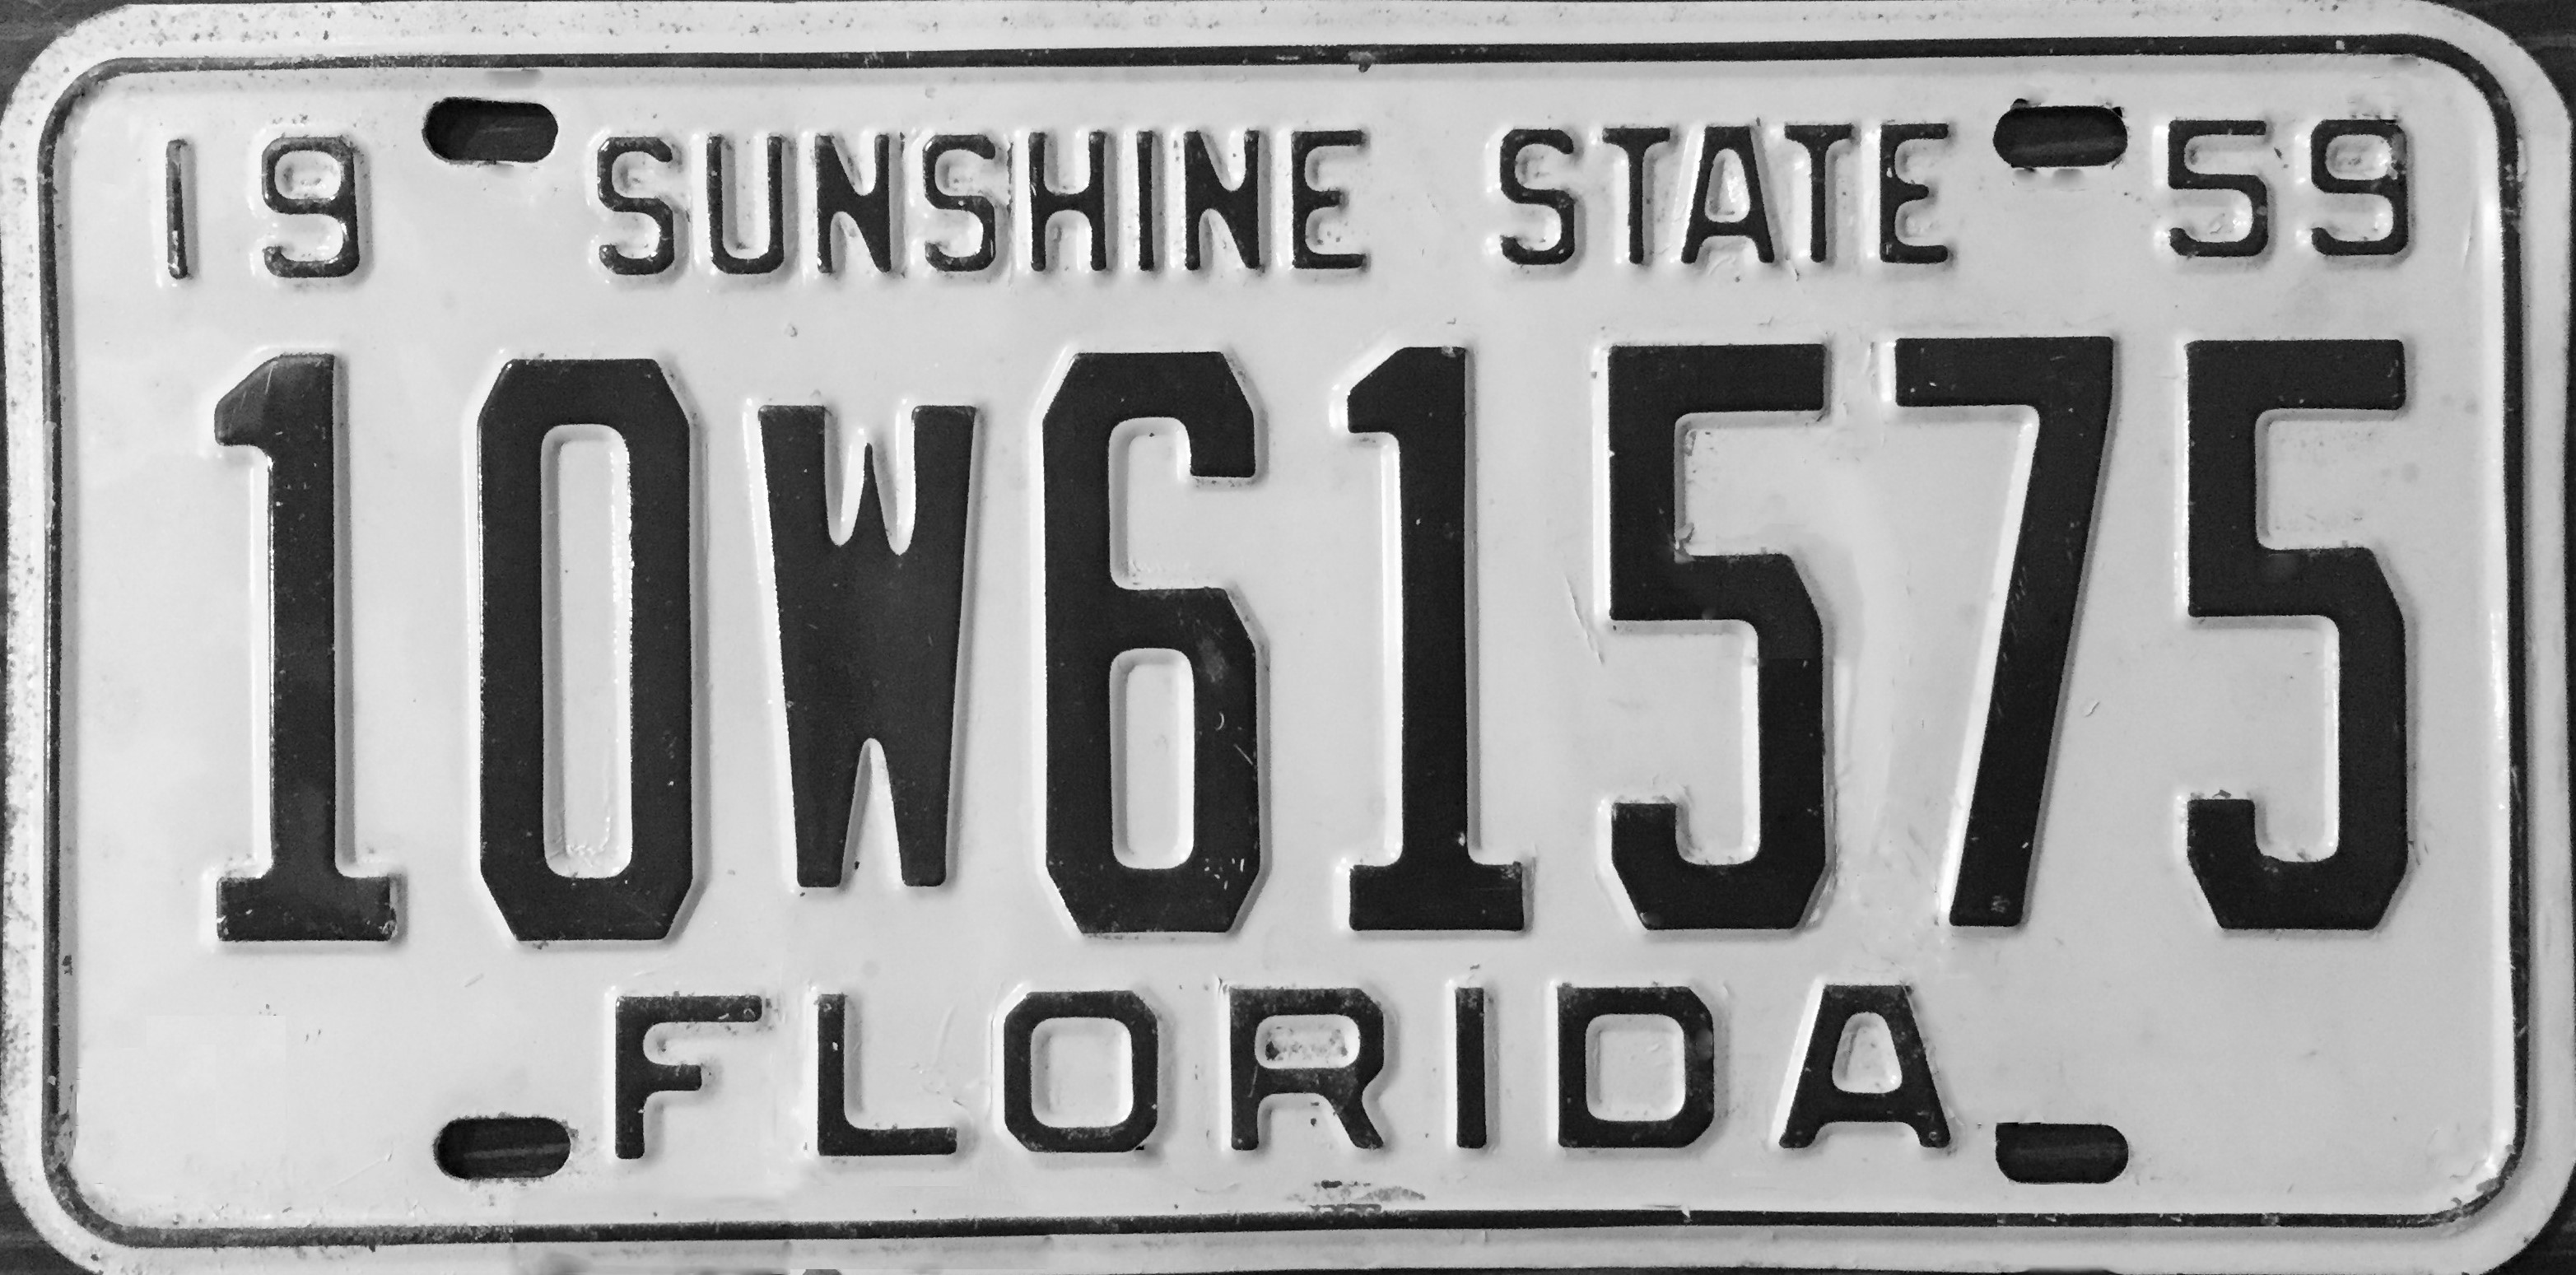 File:1959 Florida license plate.JPG - Wikimedia Commons